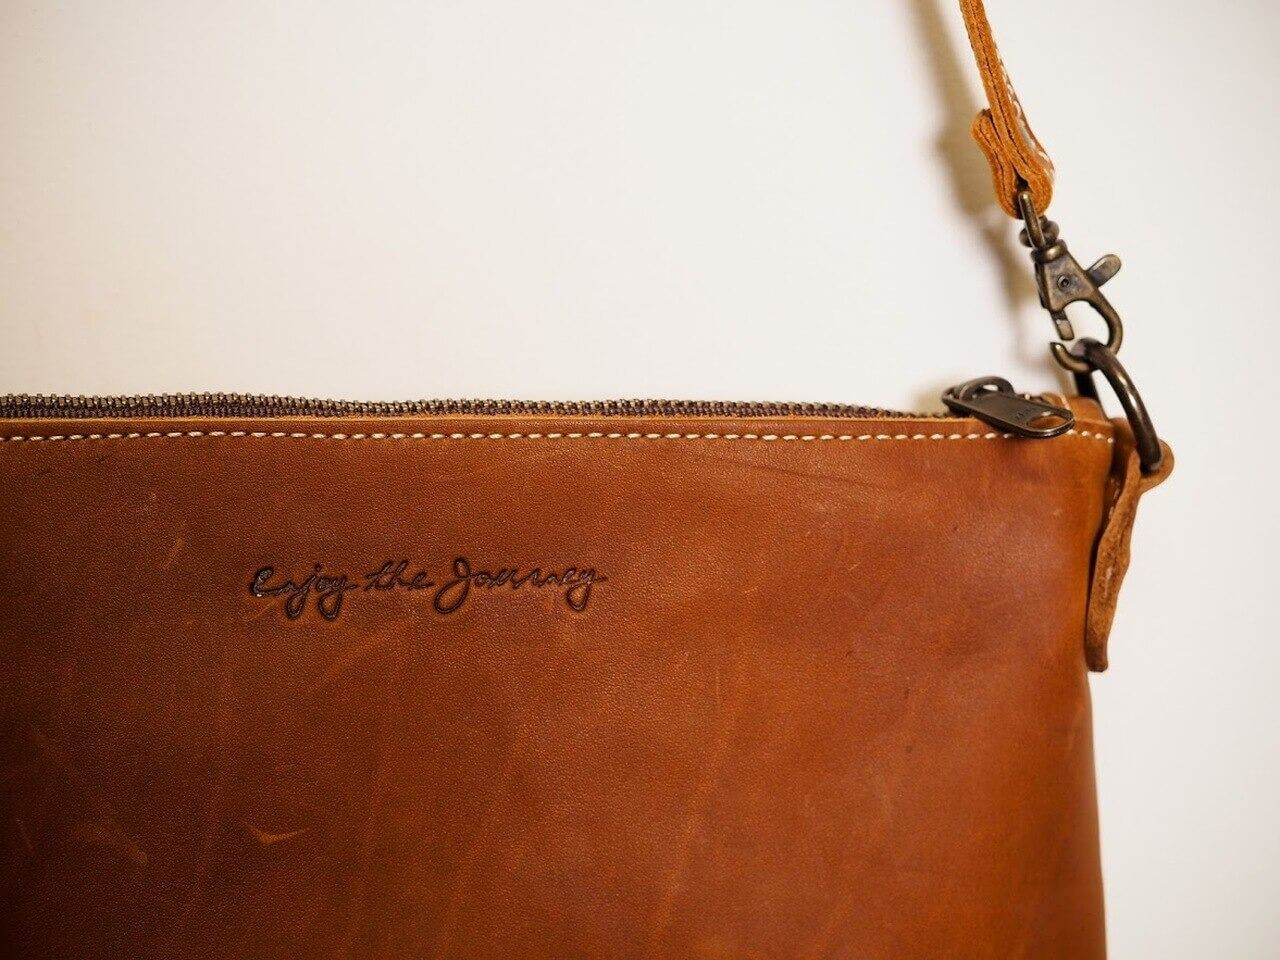 Large Crossbody Handbag in Indio Whiskey